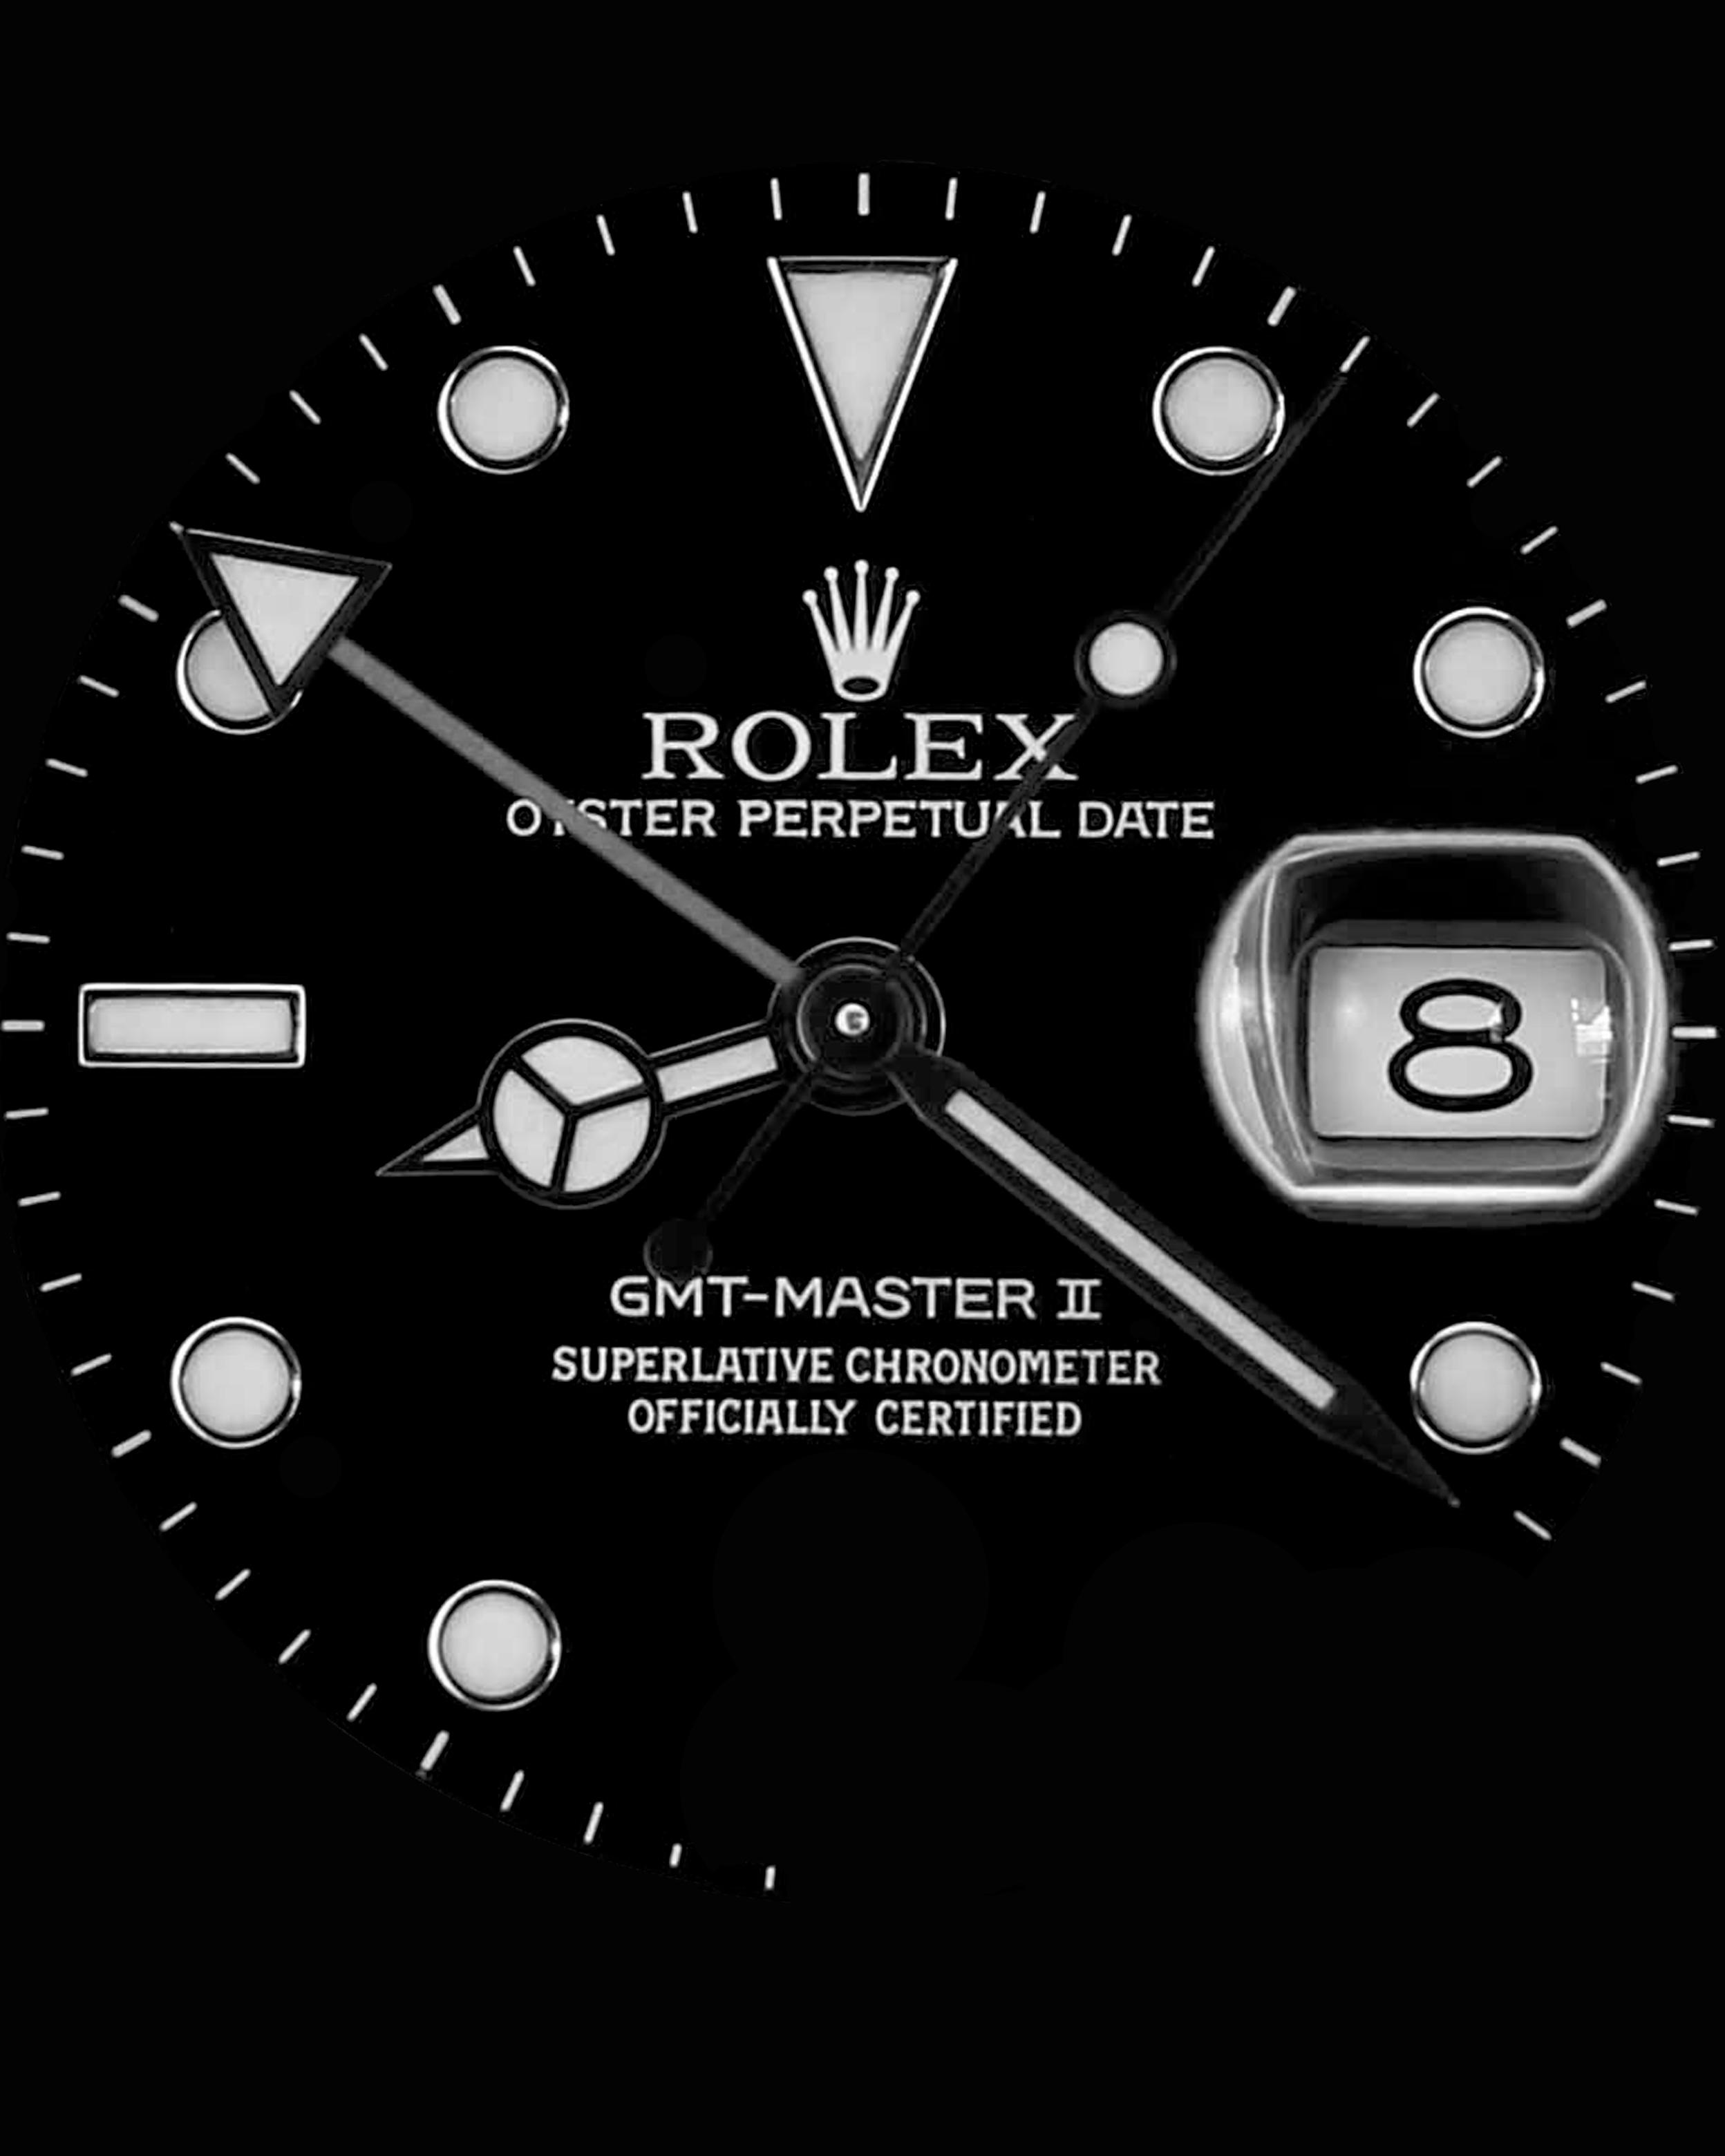 Iphone 壁紙 Rolex 16520 の検索結果 Yahoo 検索 画像 エルメス Apple Watch Iphone ウォッチ アップルの壁紙